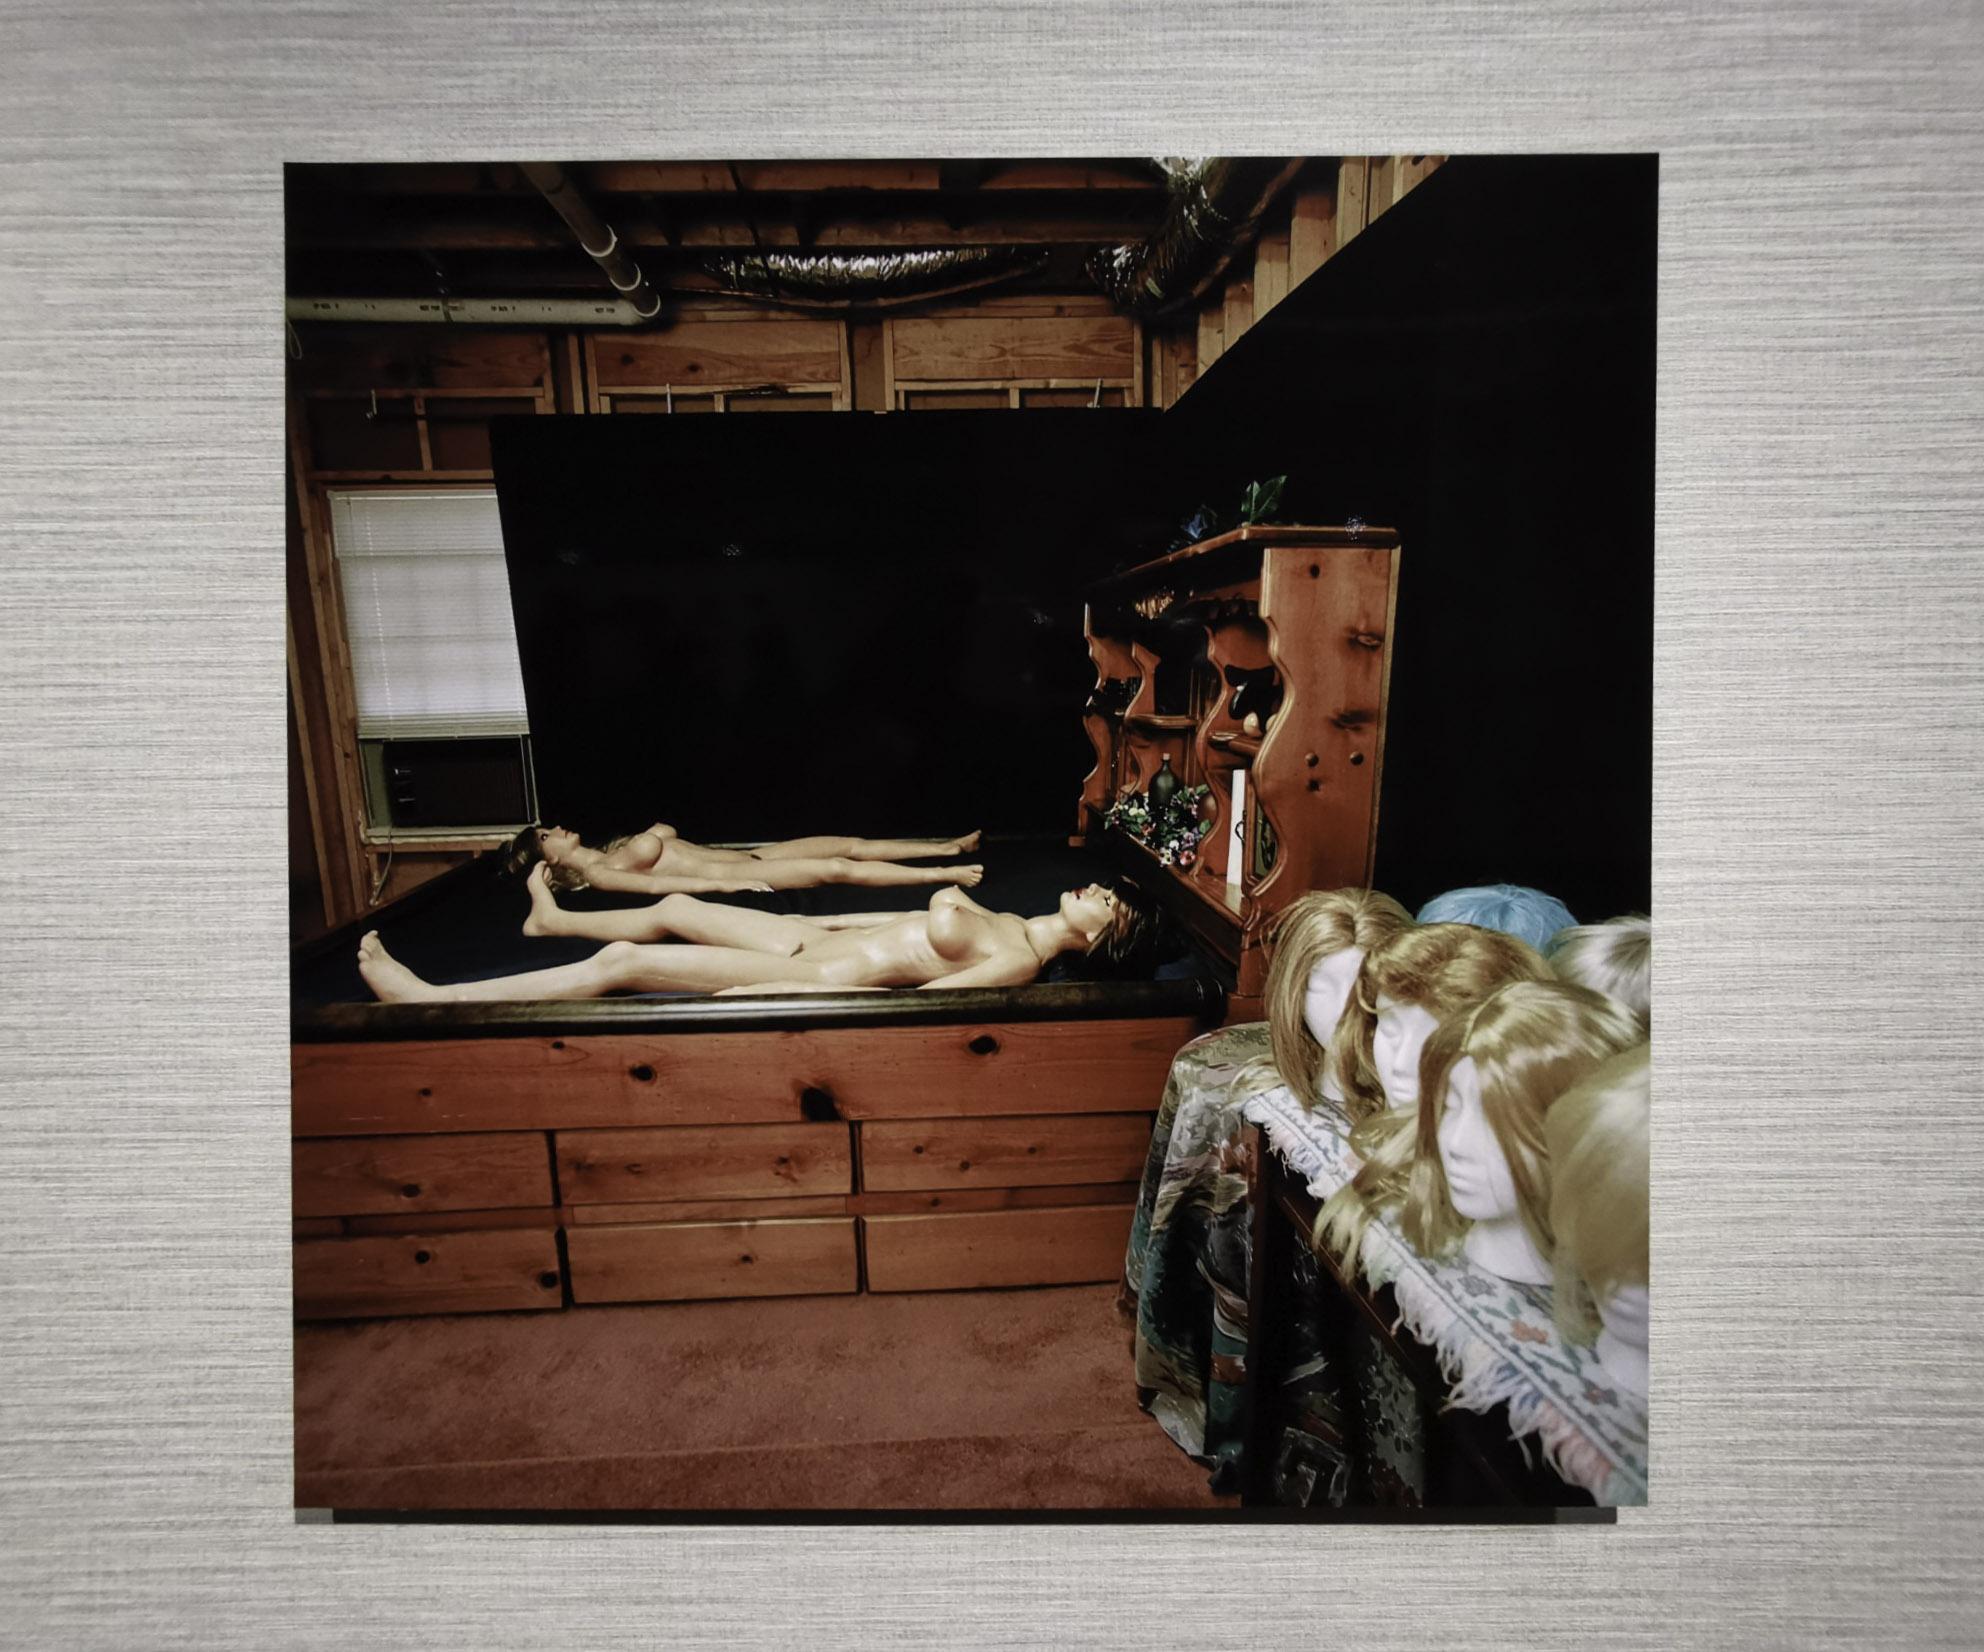 Surrogati. Un Amore Ideale At Prada Fondazione (27 - 29).jpg